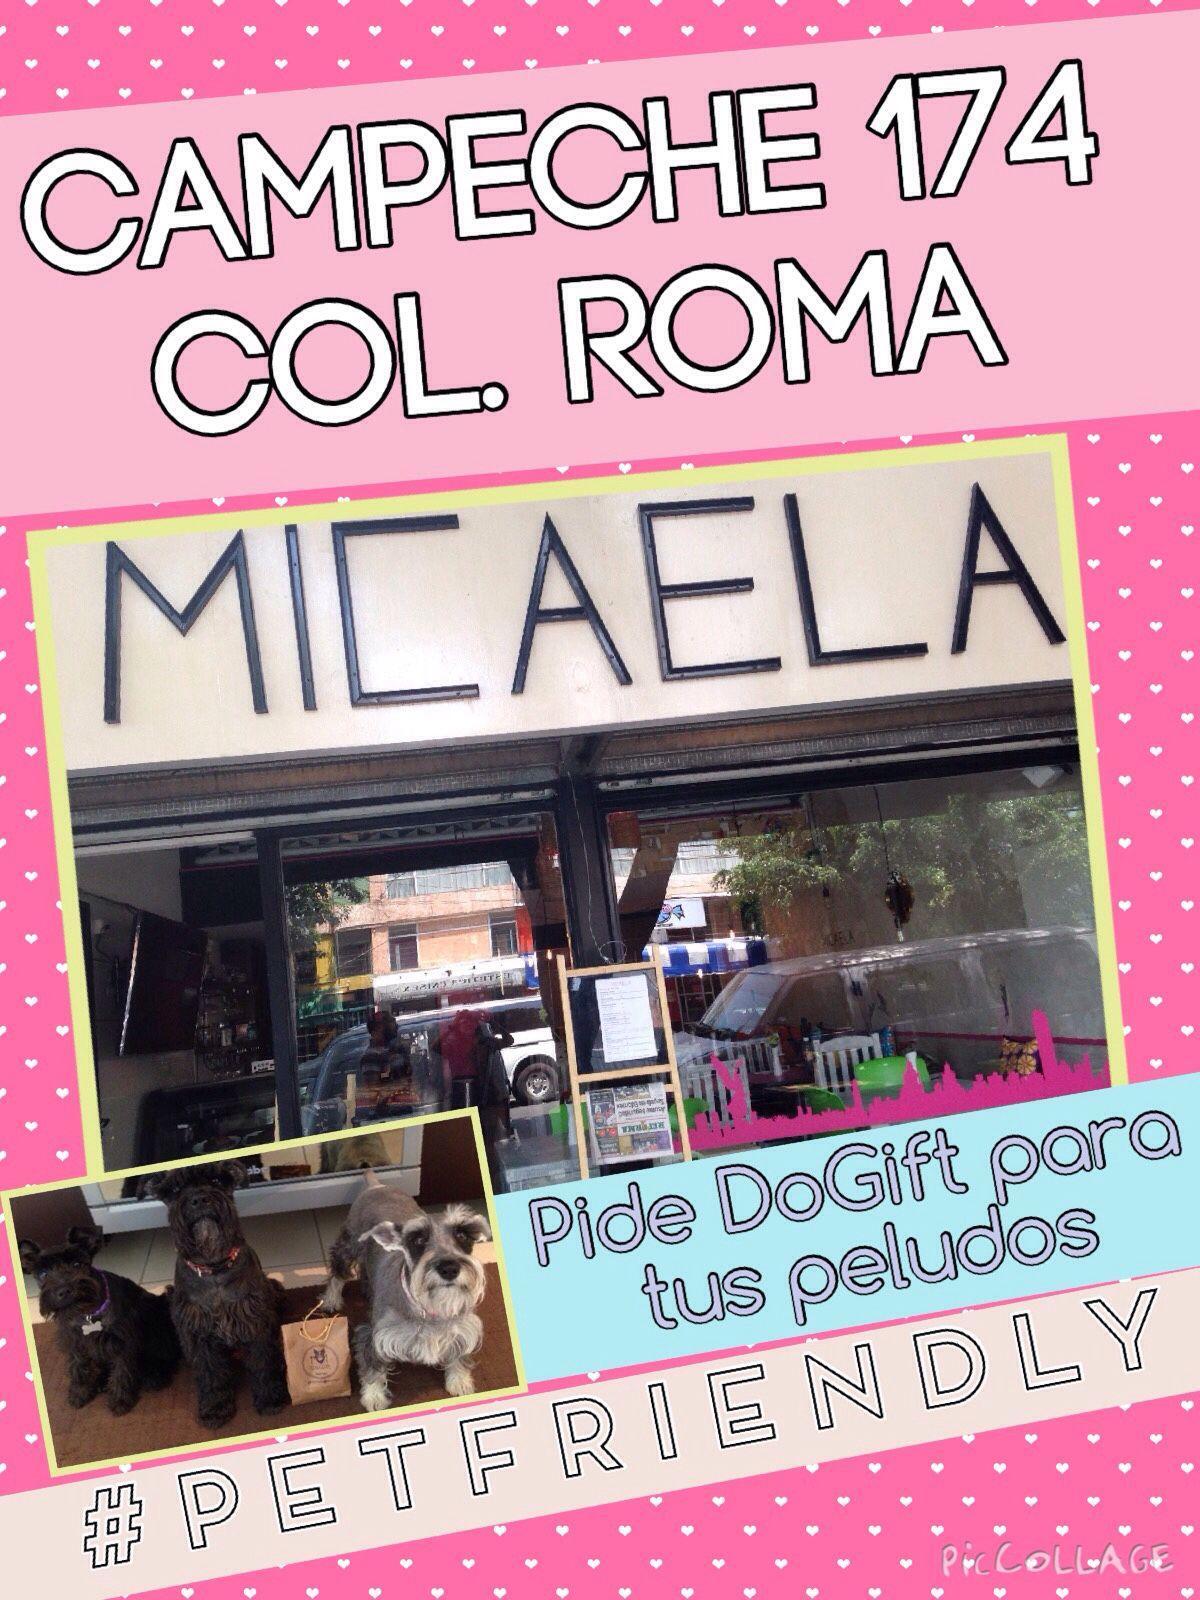 Enamórate en Micaela! Prueba deli menú! #distribuidordogift @laromadf @roma_condesaMX @RomaCondesa @ColoniasCondesa